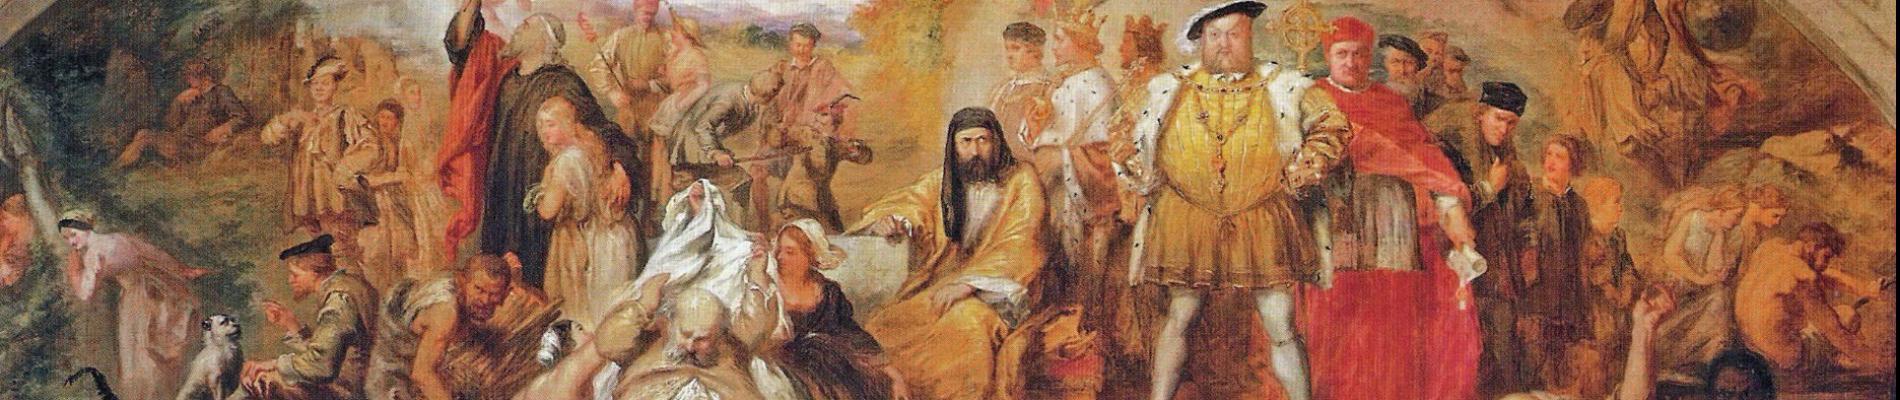 Shakespeare's King Lear and the History of Tudor-Stuart England